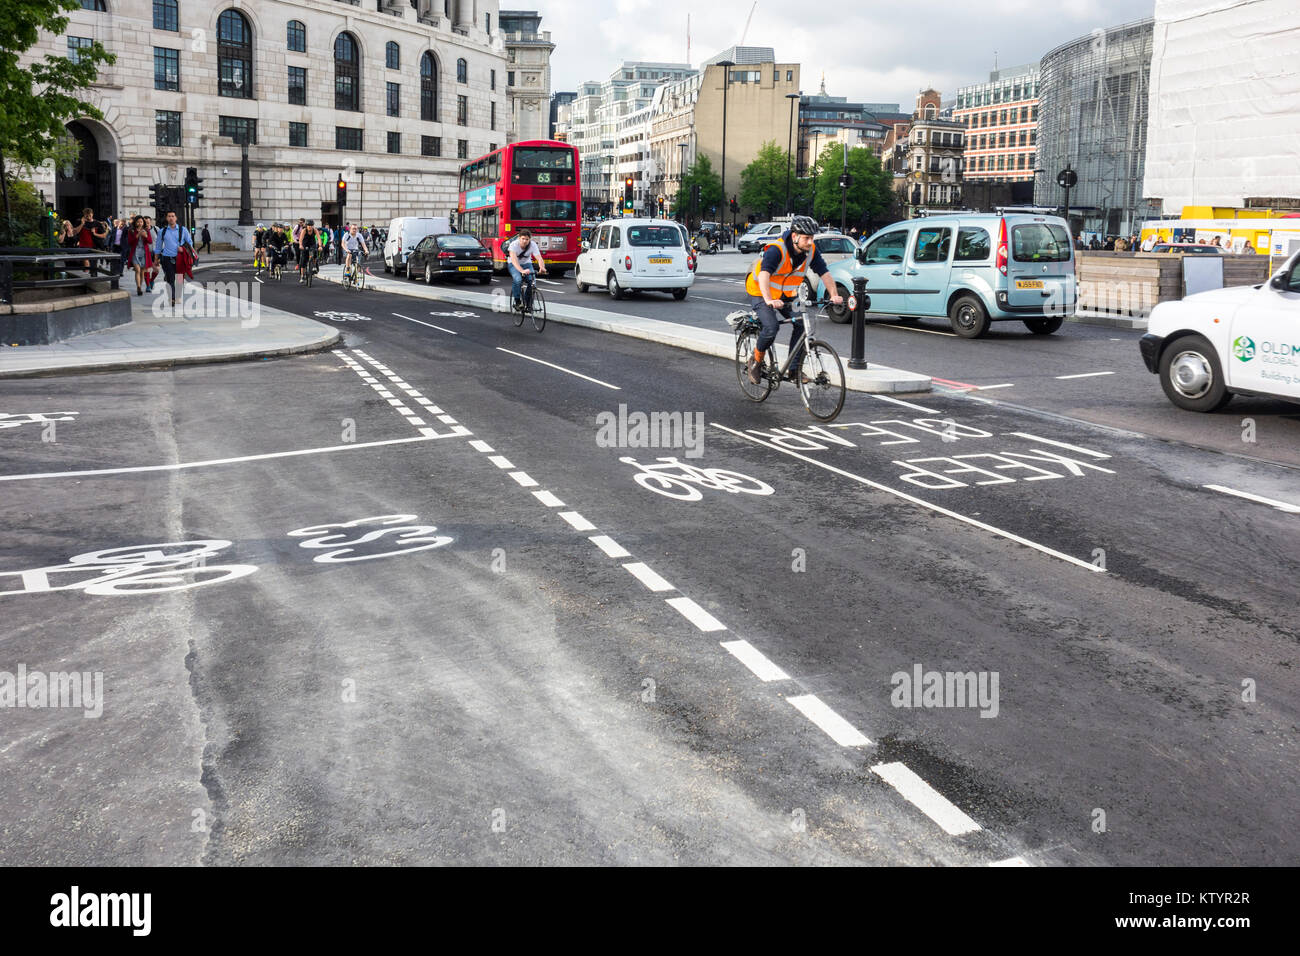 North-South Cycle Superhighway on Blackfriars Bridge, London, UK - Stock Image